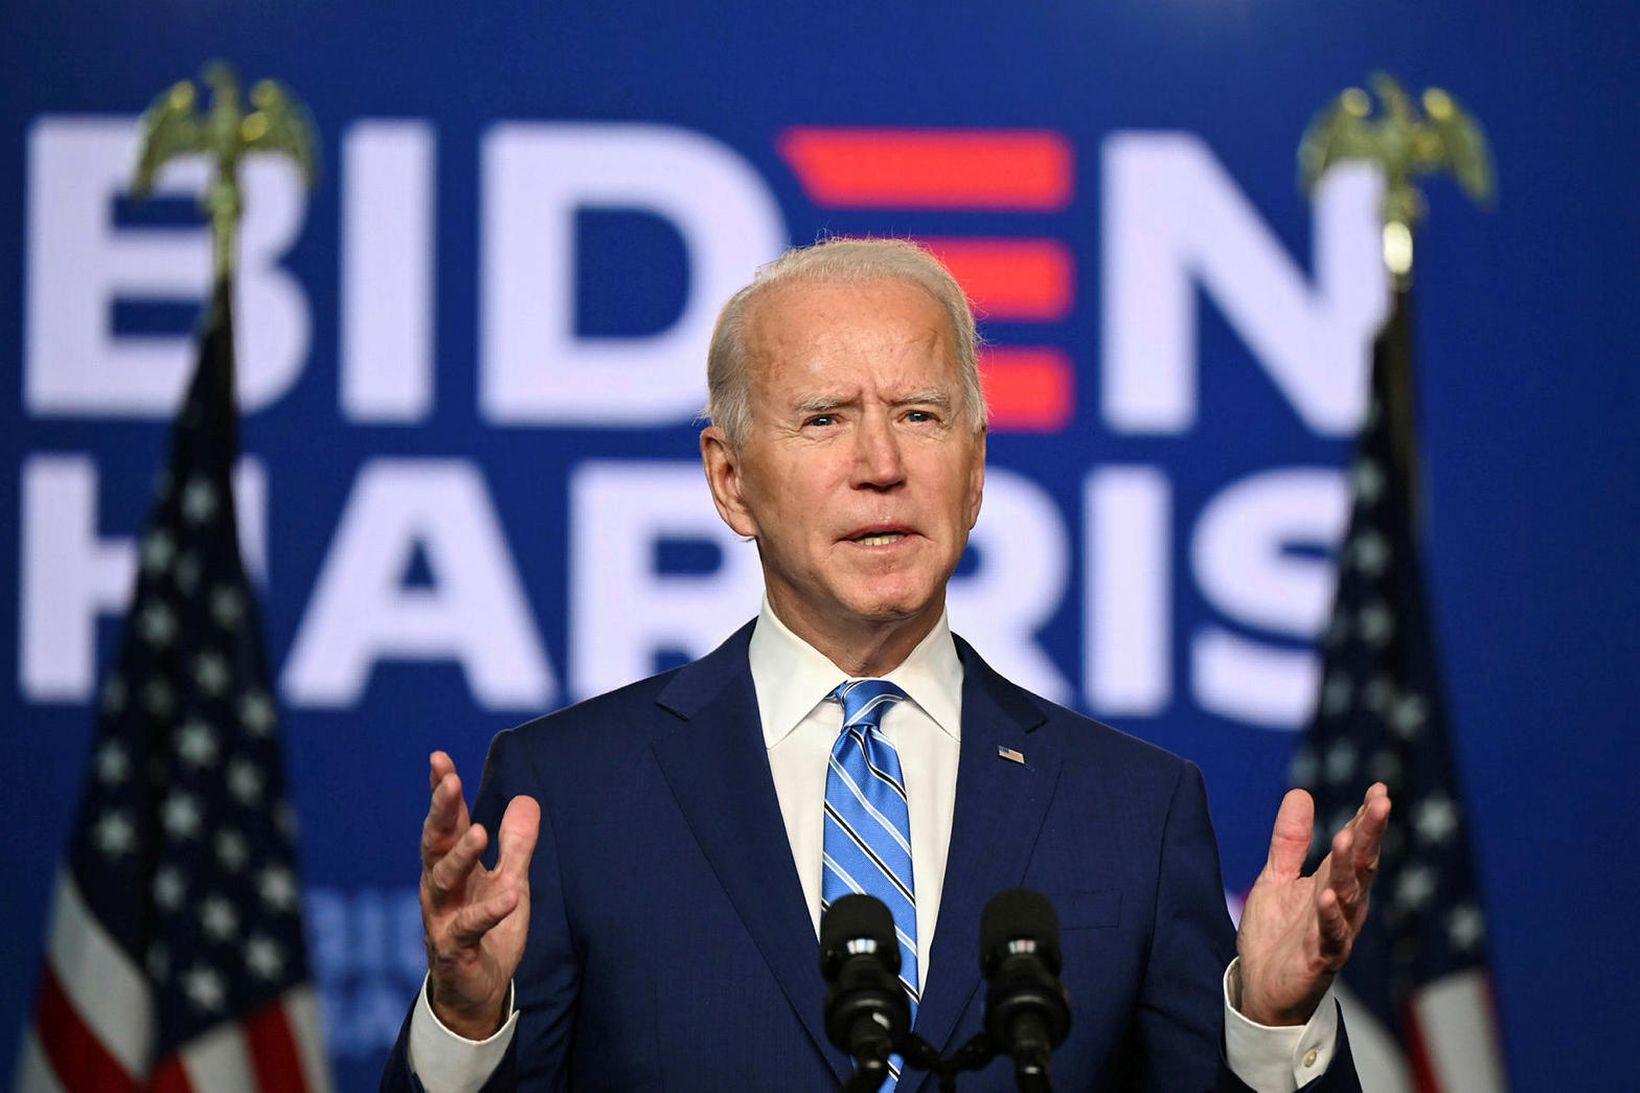 Joe Biden verður 46. forseti Bandaríkjanna.